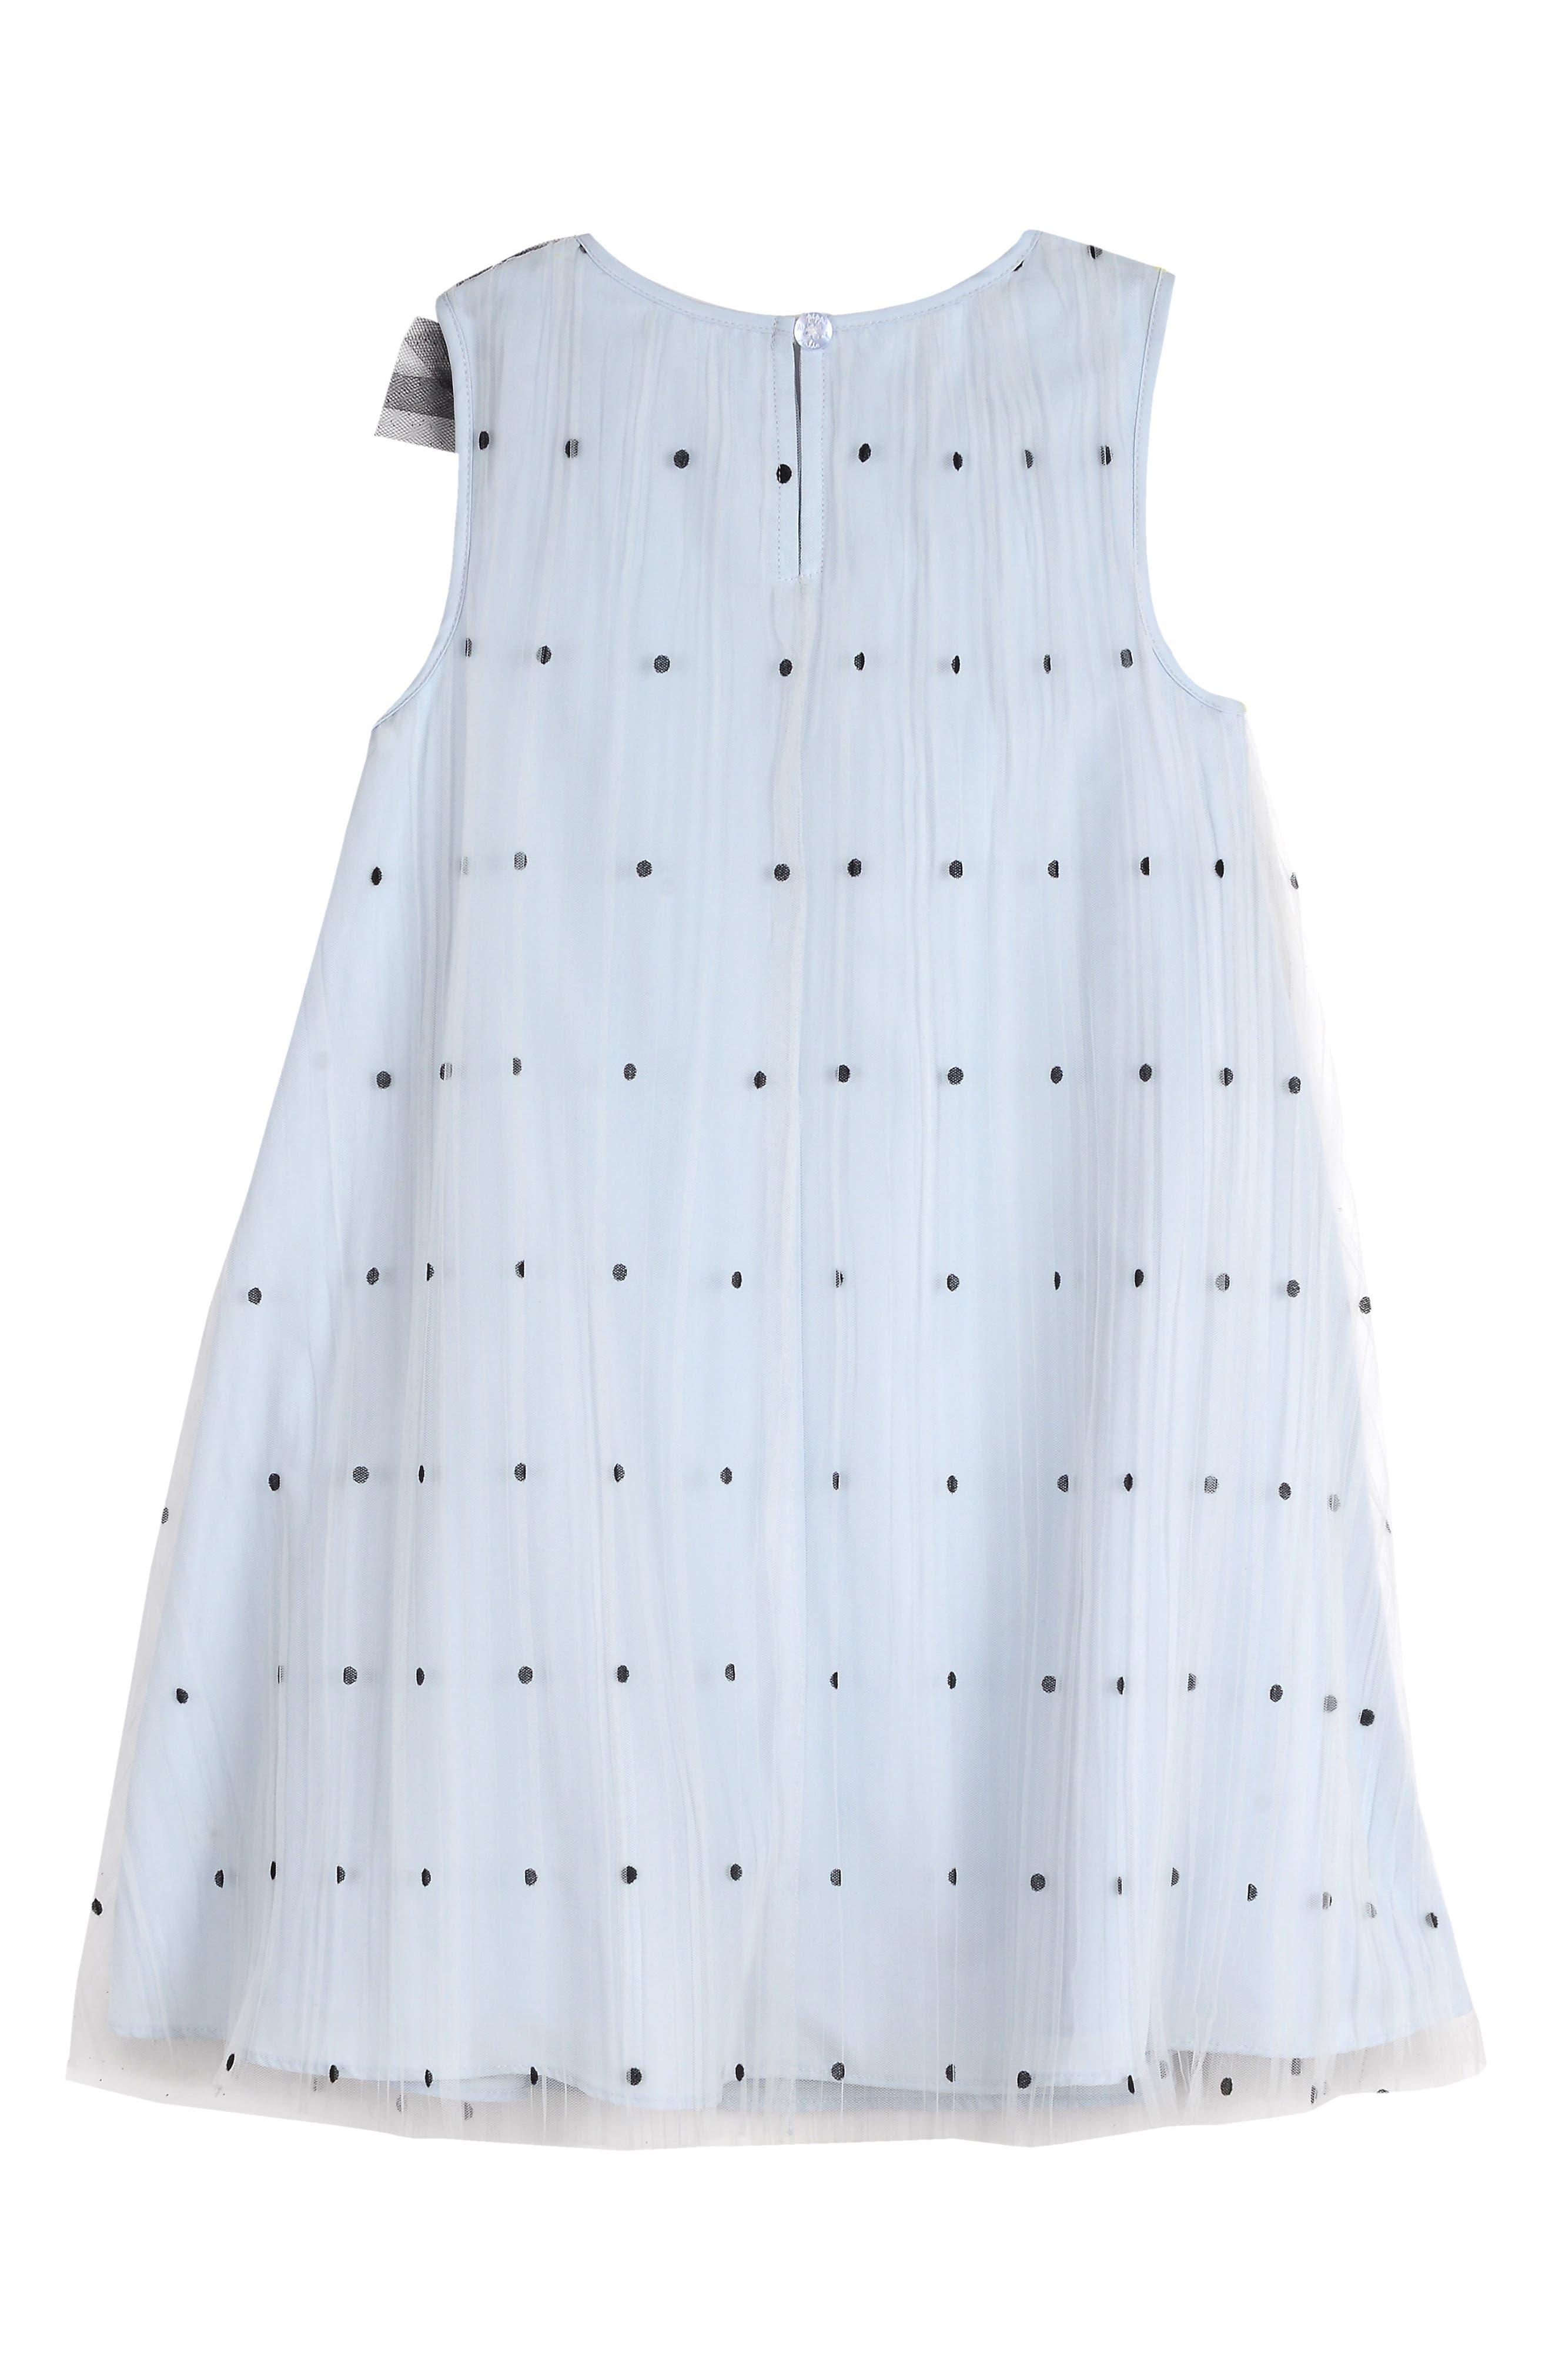 PIPPA & JULIE, Polka Dot Tulle Shift Dress, Alternate thumbnail 2, color, BLUE/ BLACK